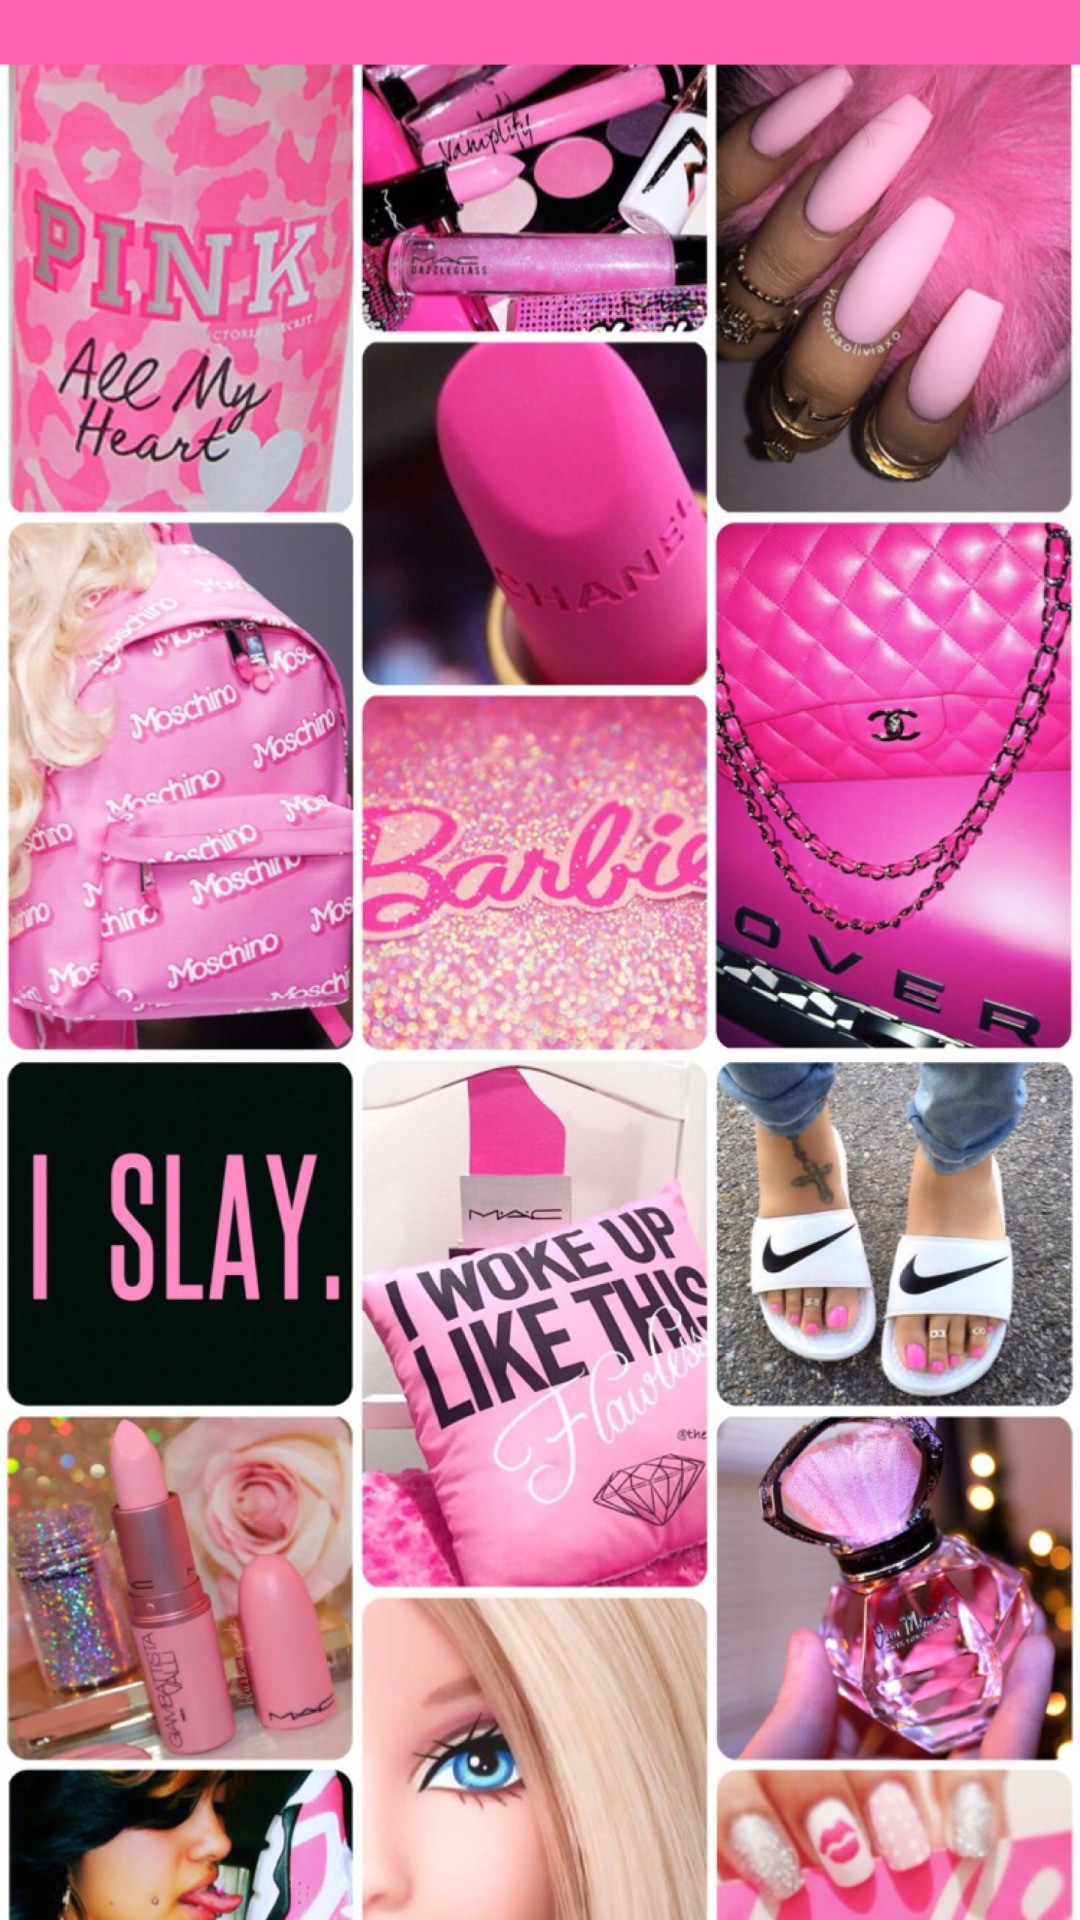 J3nnybabyxotumblr · Pink WallpaperPhone …